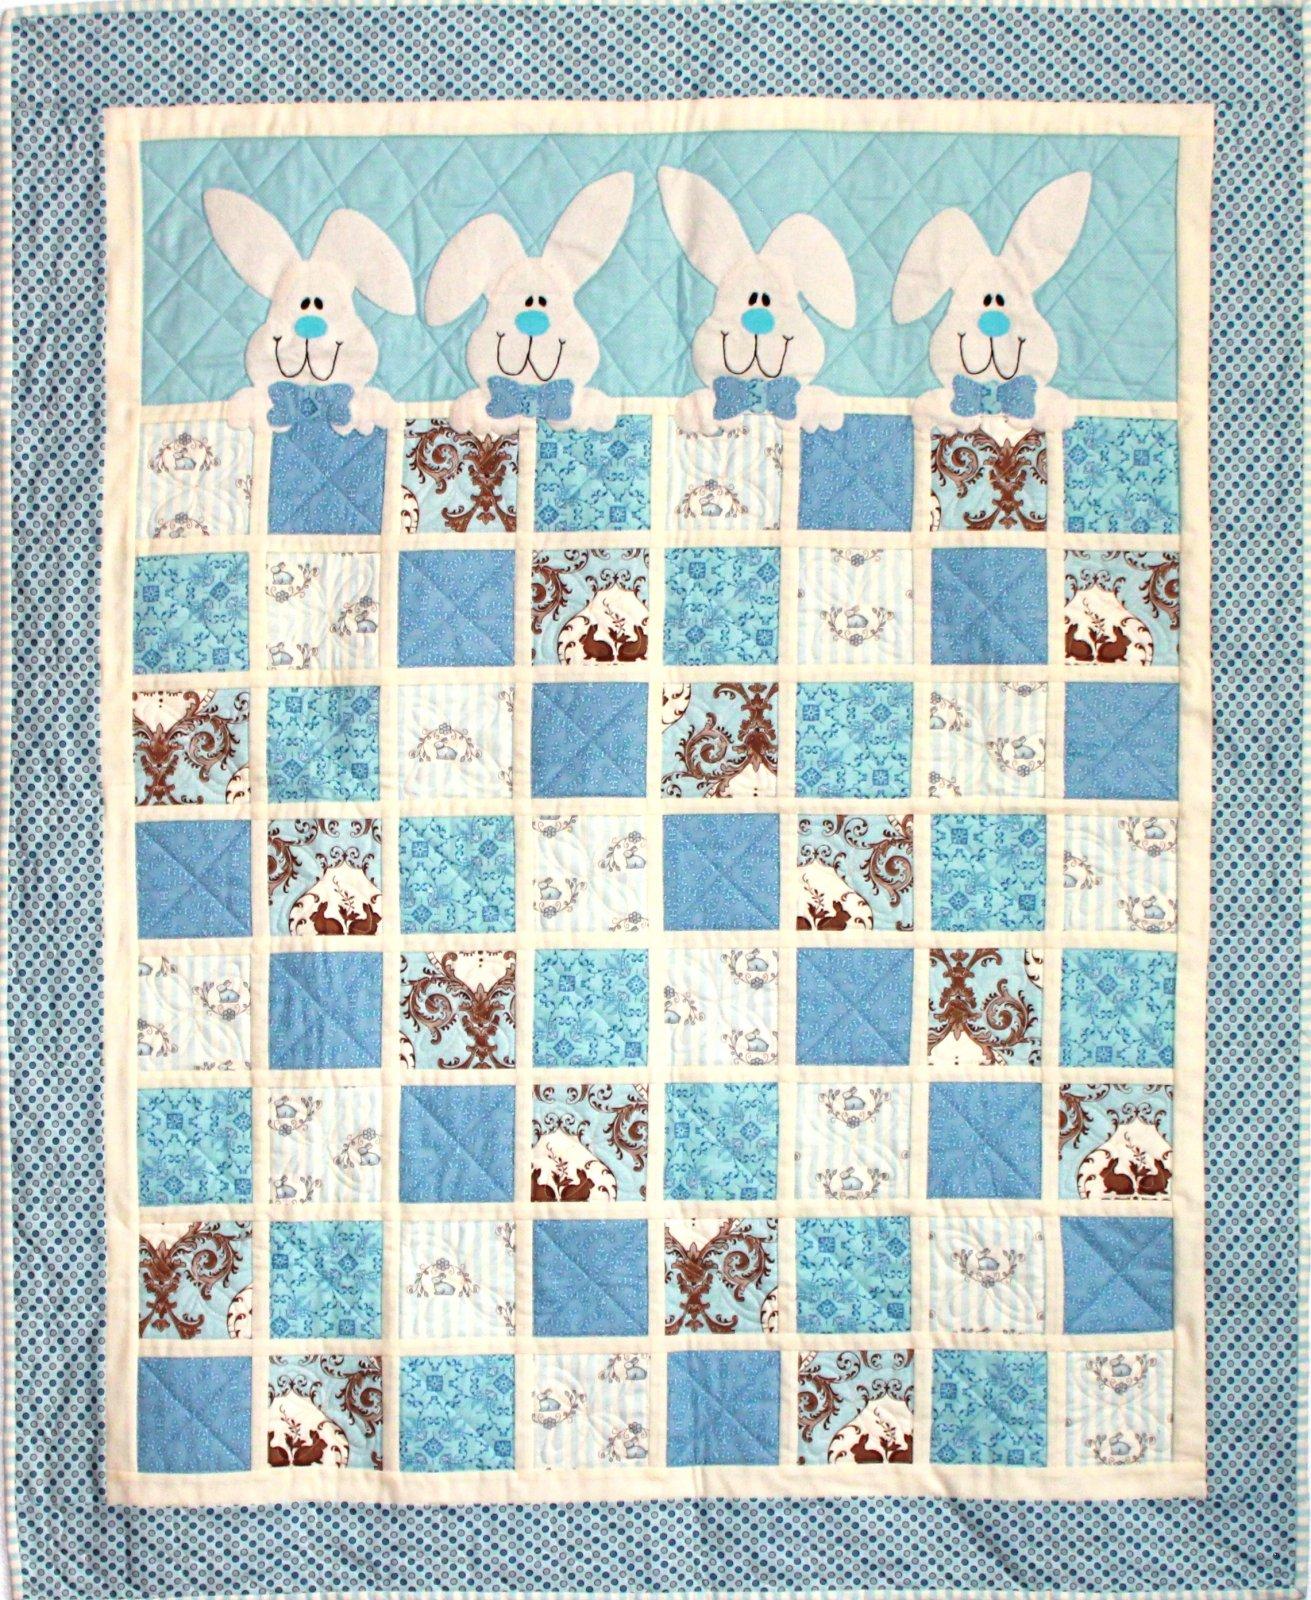 Bunnies - Bunny Hugs Quilt Kit, Blue version